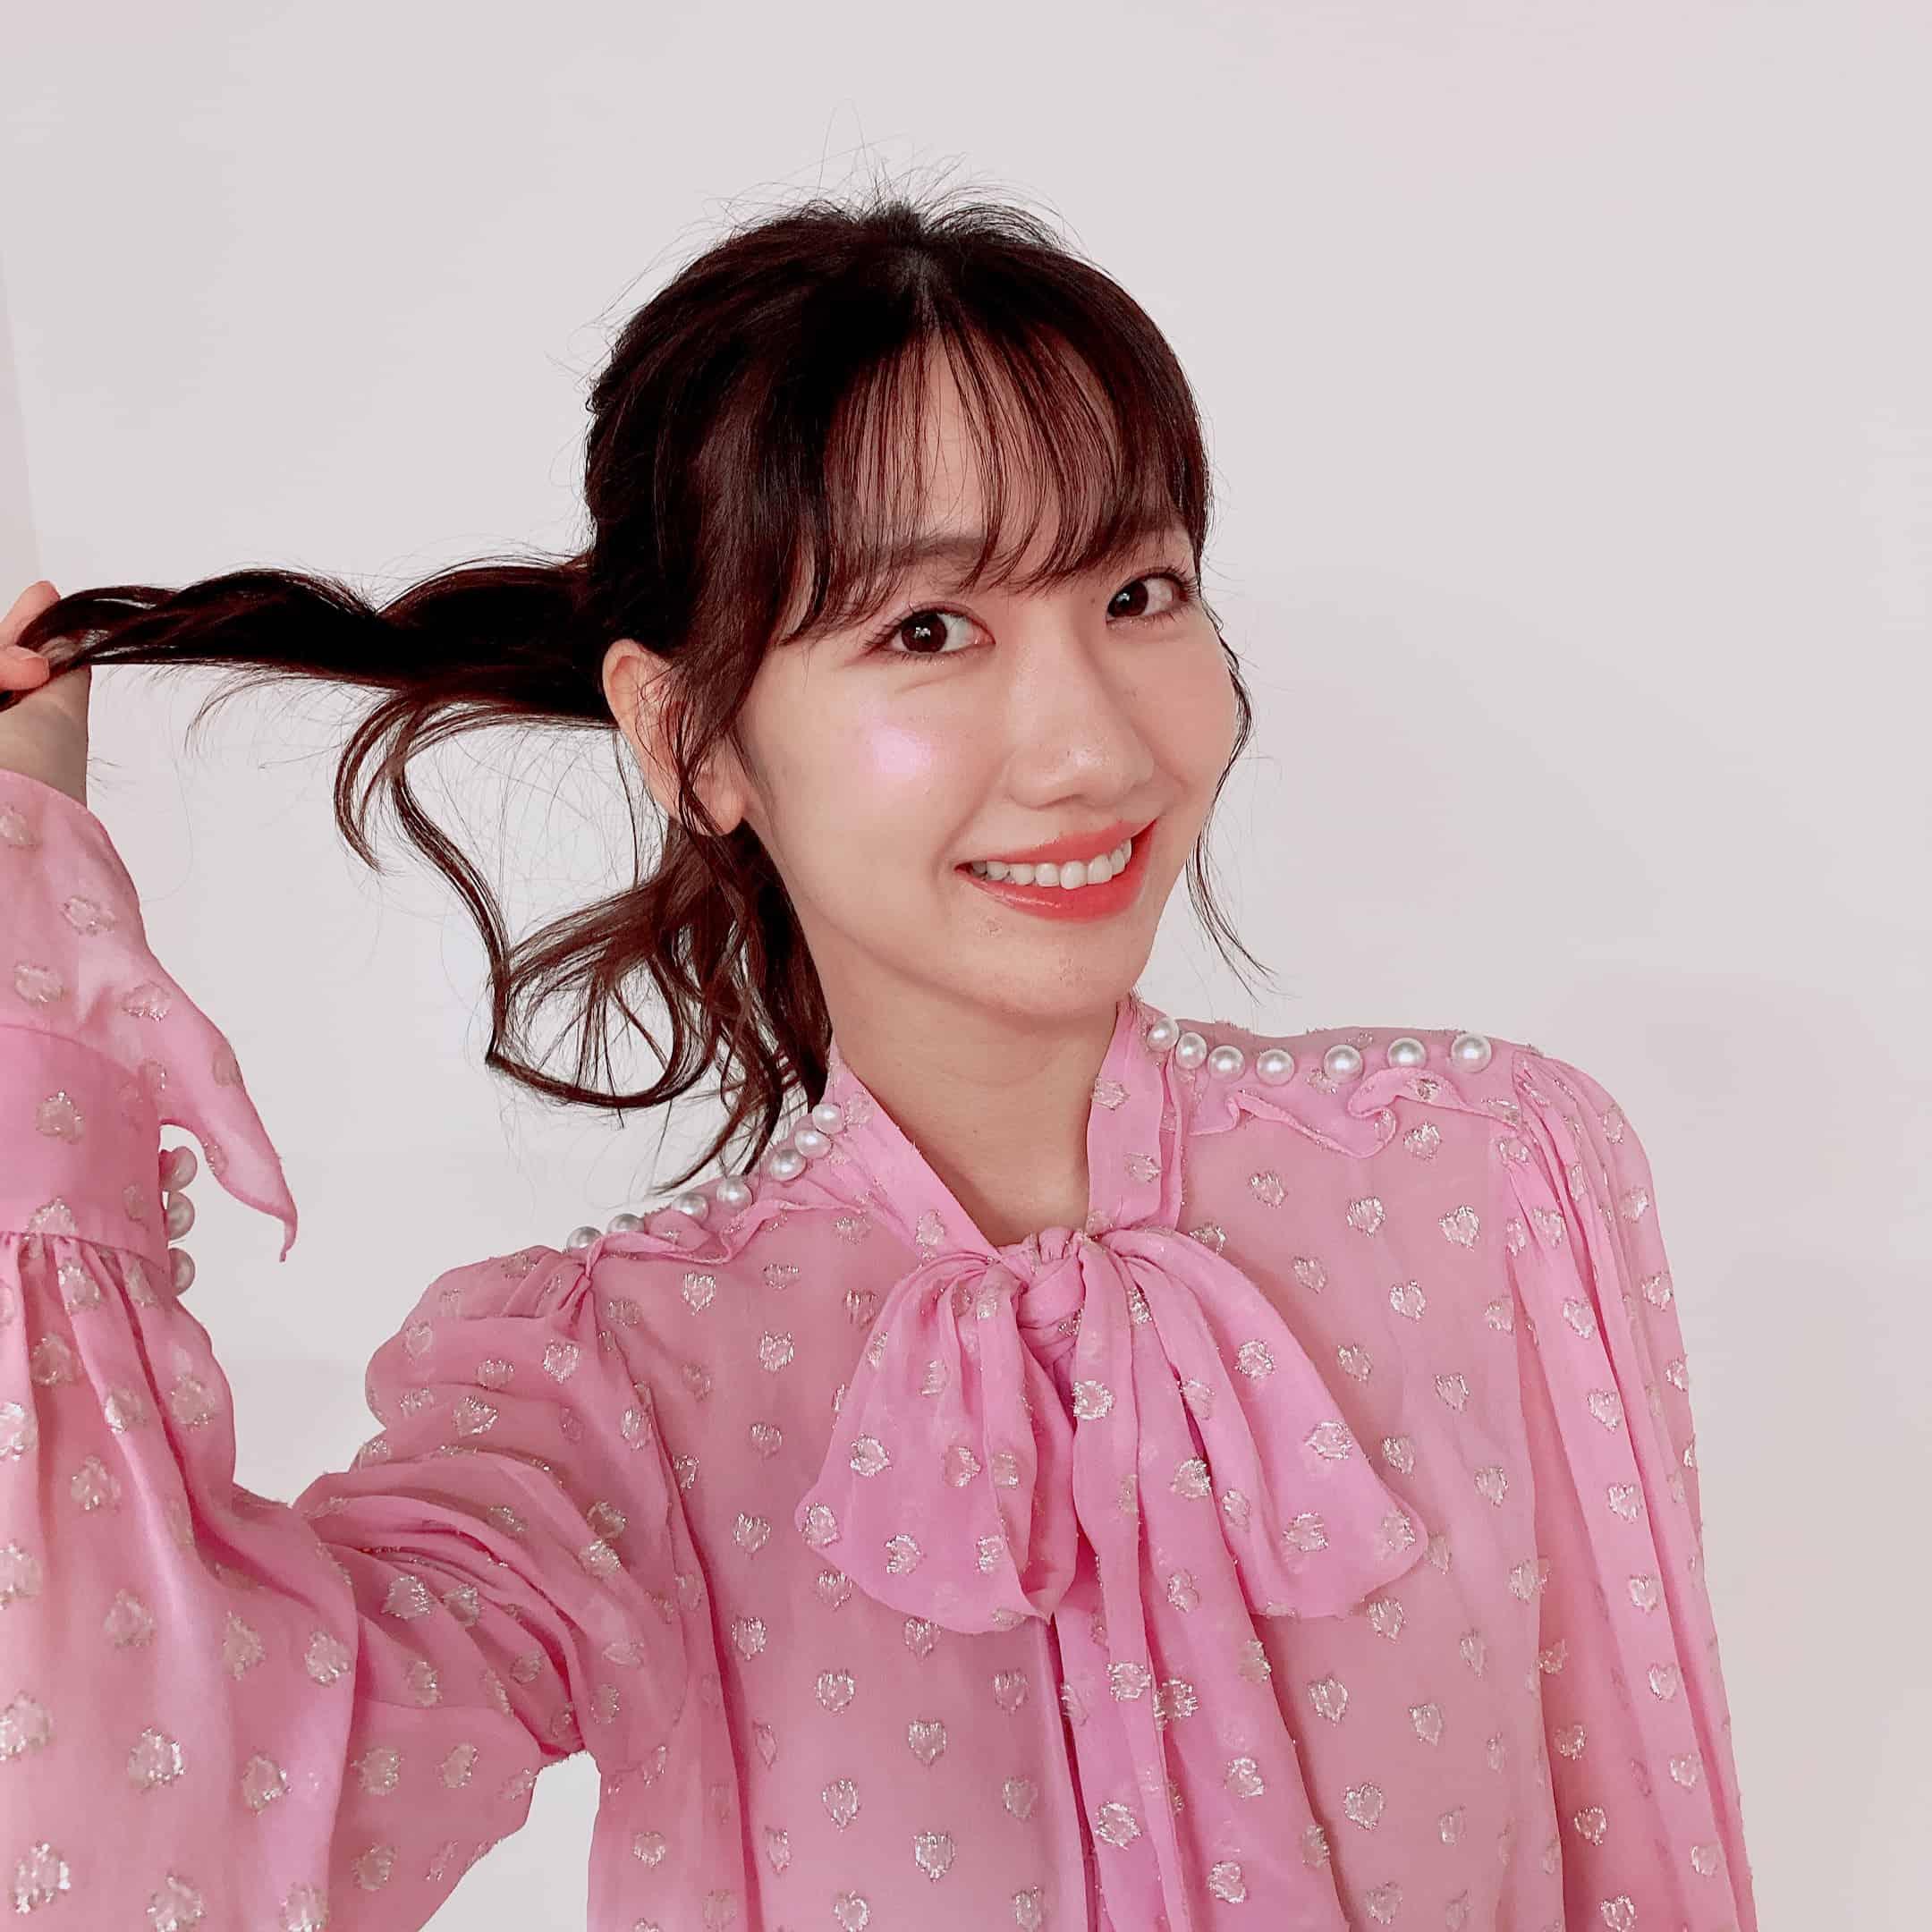 AKB48・柏木由紀】「30歳まで続ける」ゆきりん、アイドルとしての目標 ...